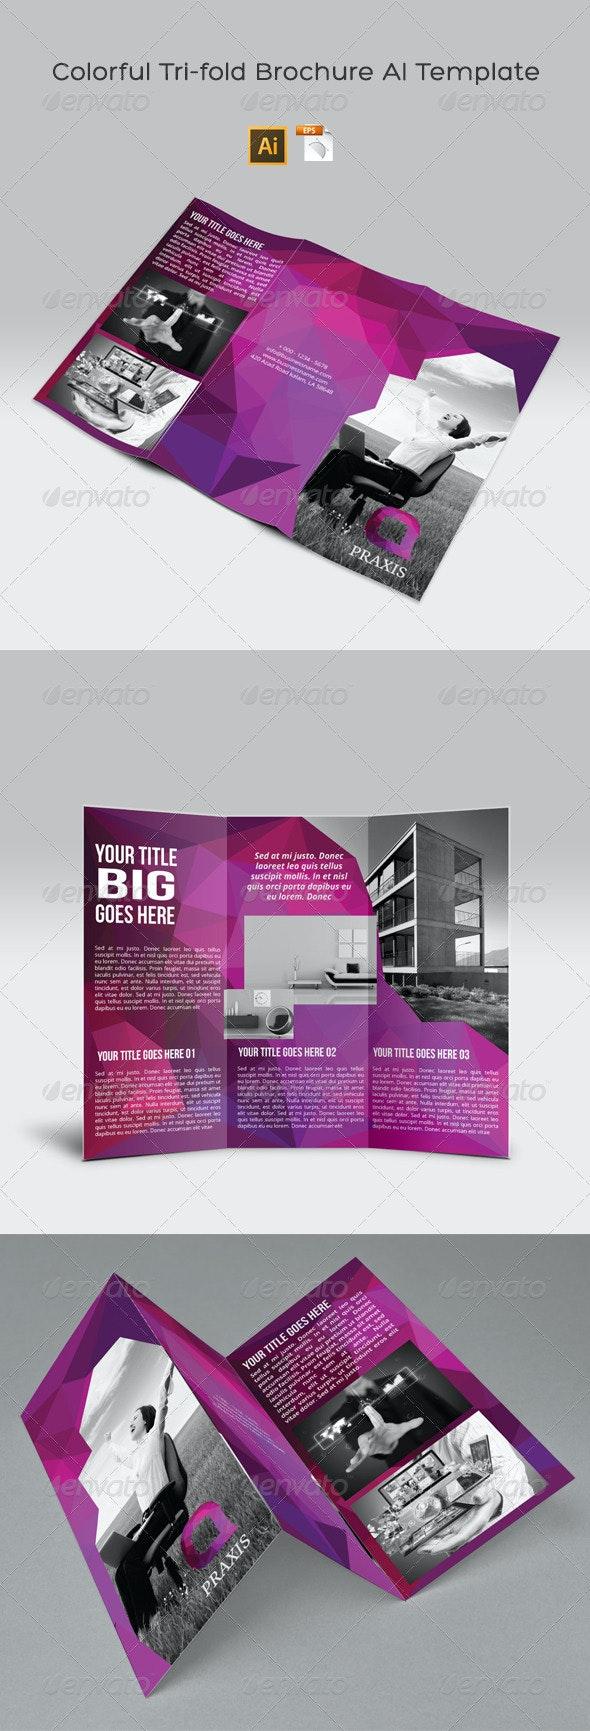 Colorful Tri-fold Brochure AI Template - Corporate Brochures